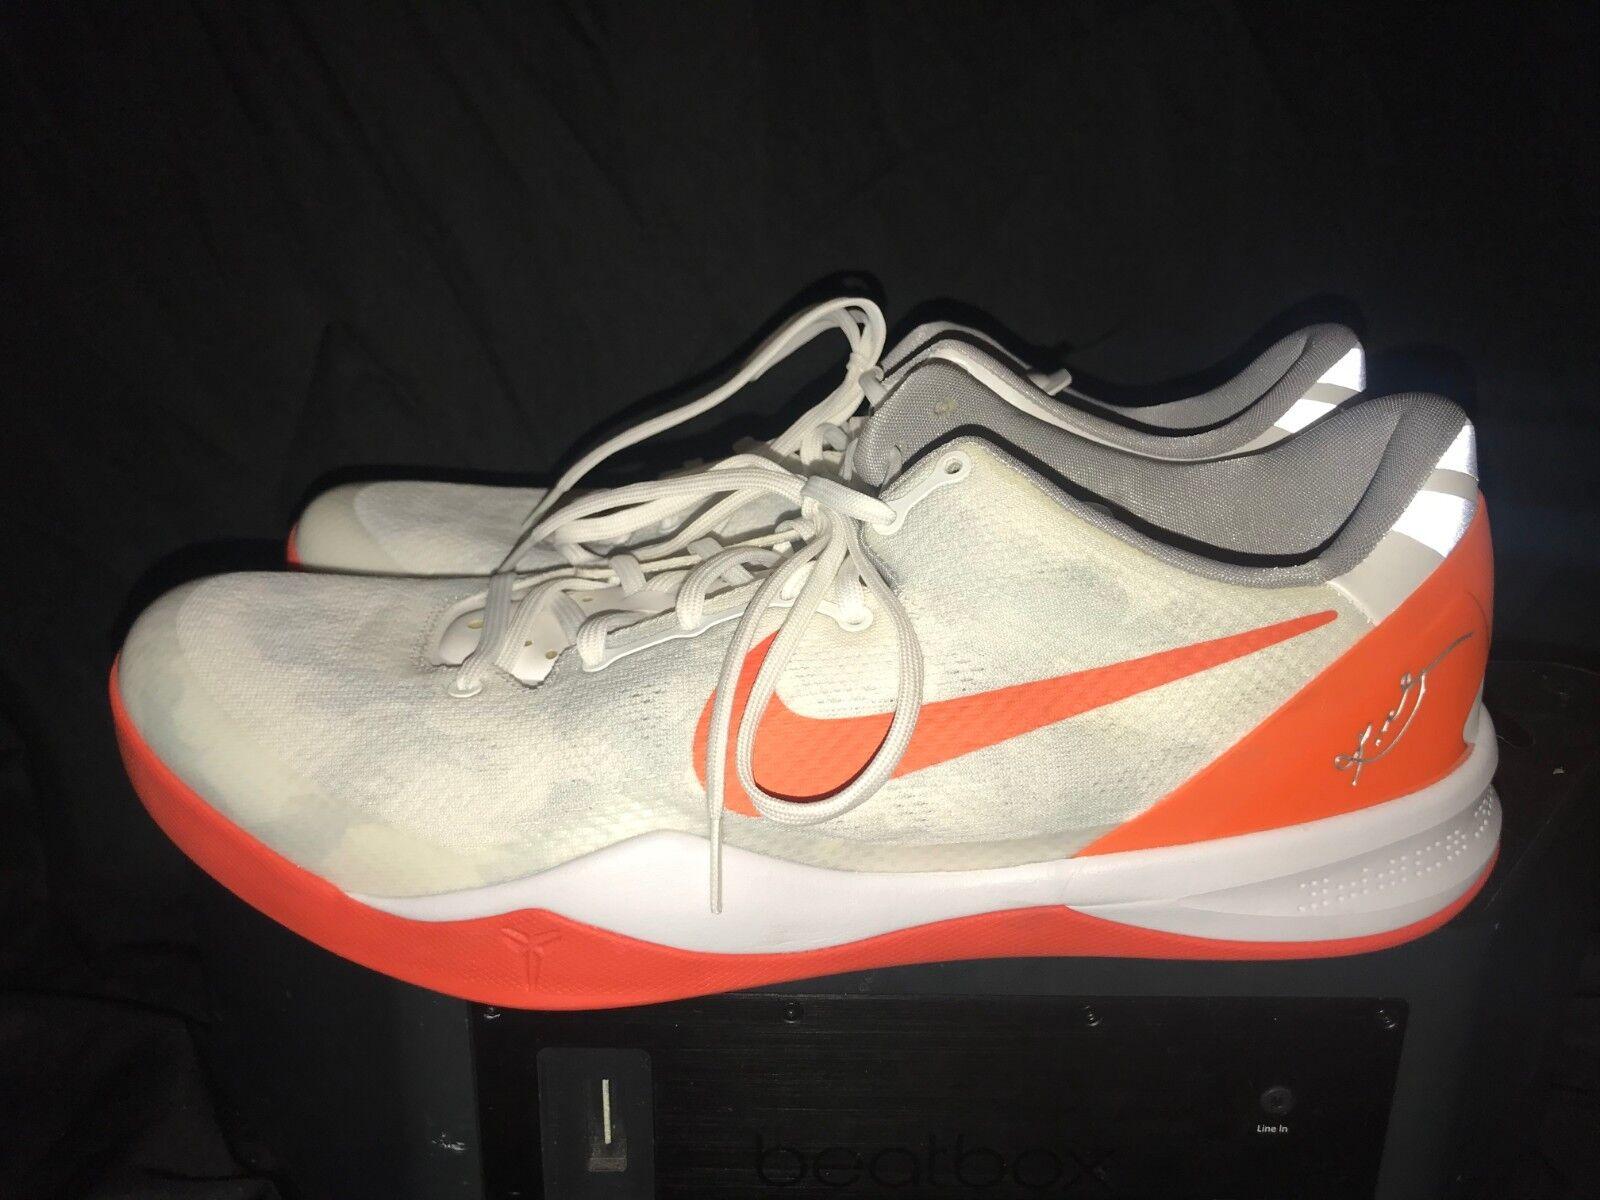 Nike kobe system 8 e ghost orange Grau ghost e  16,5 547fad